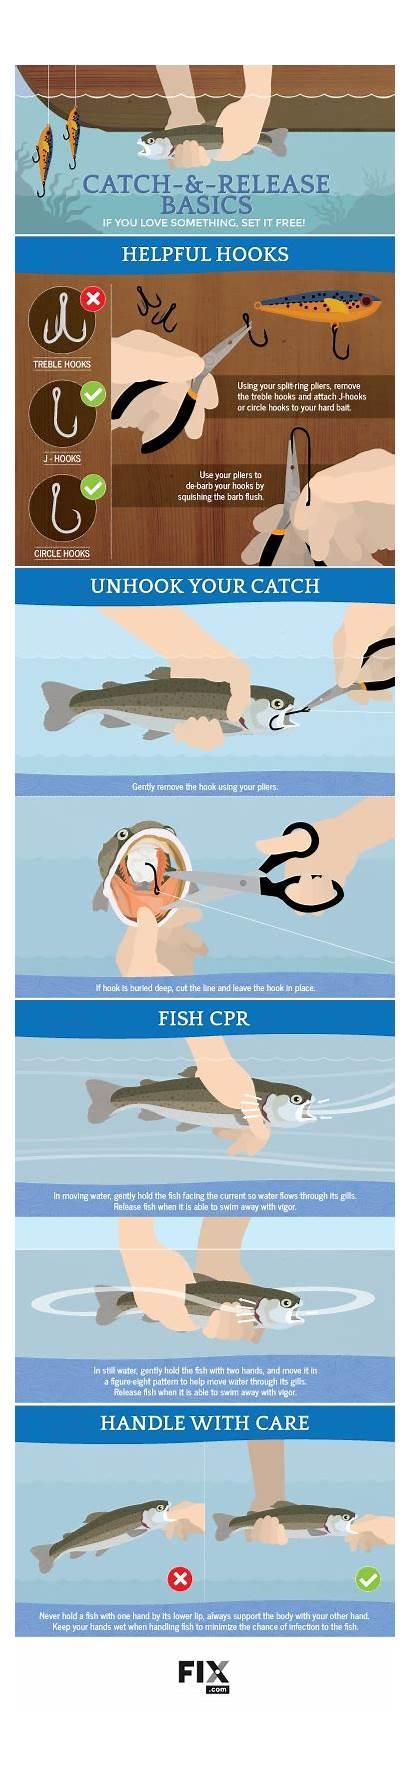 Catch Release Fishing Fix Fish Guide Tips